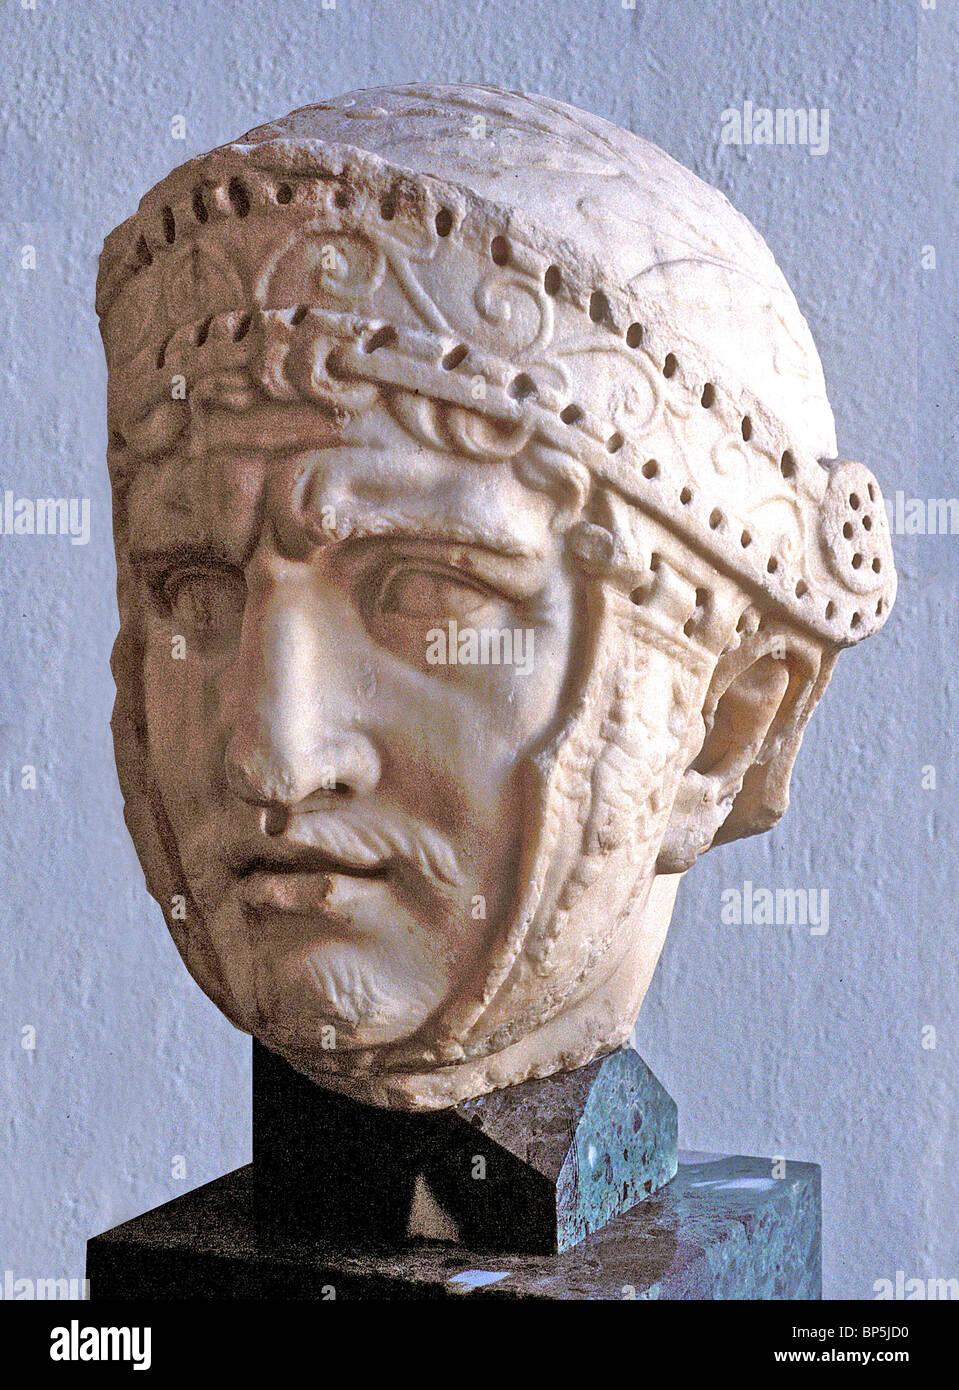 3761. ROMAN SOLDIER WITH HELMET - Stock Image